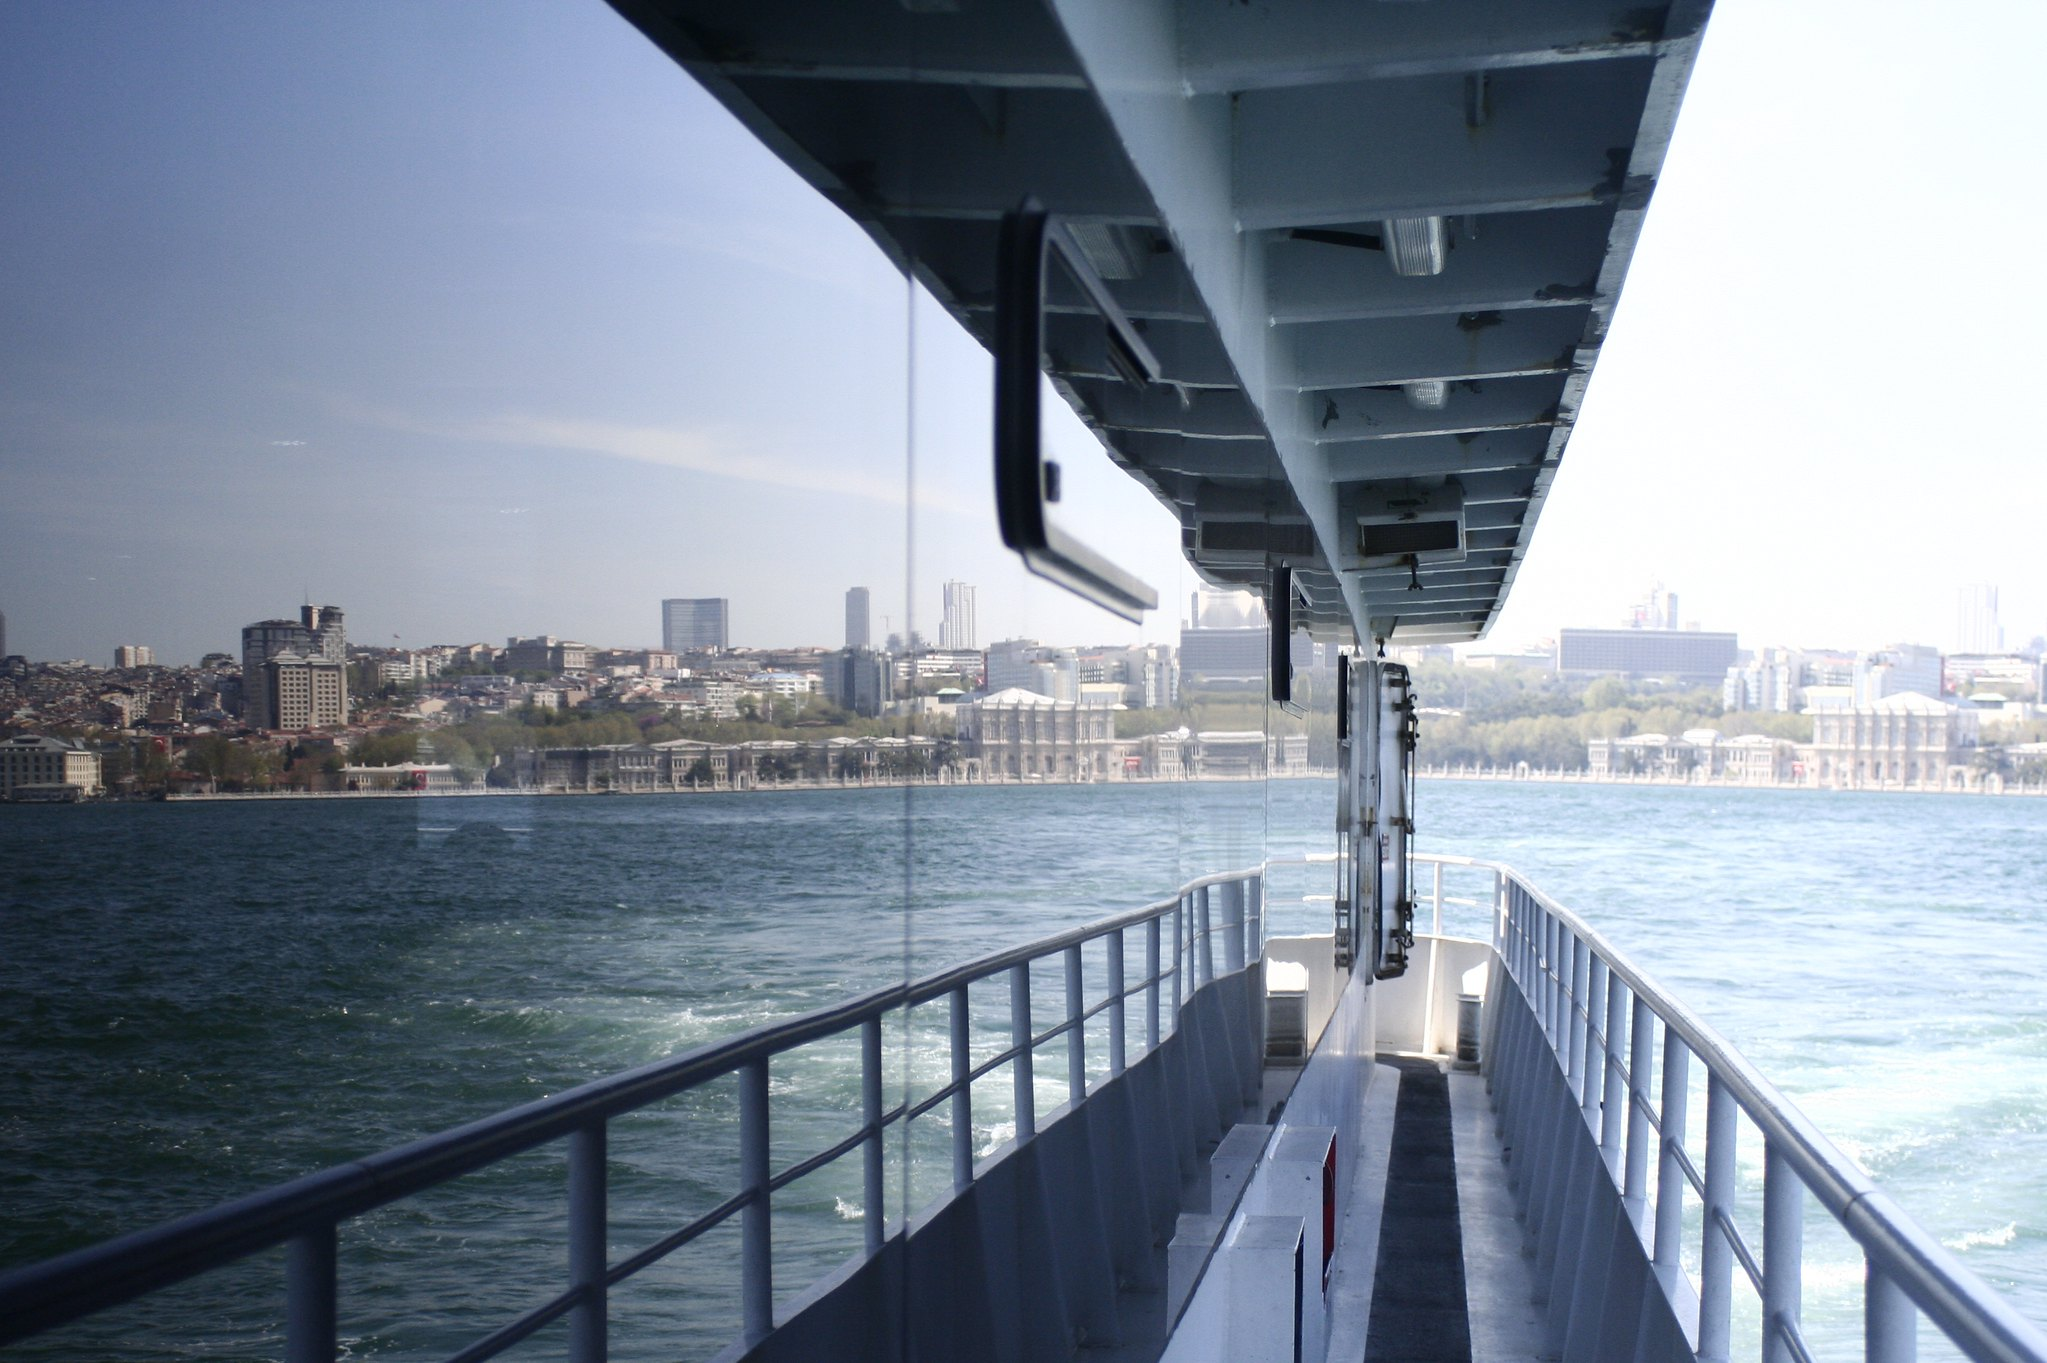 On a boat from Beşiktaş to Üsküdar.